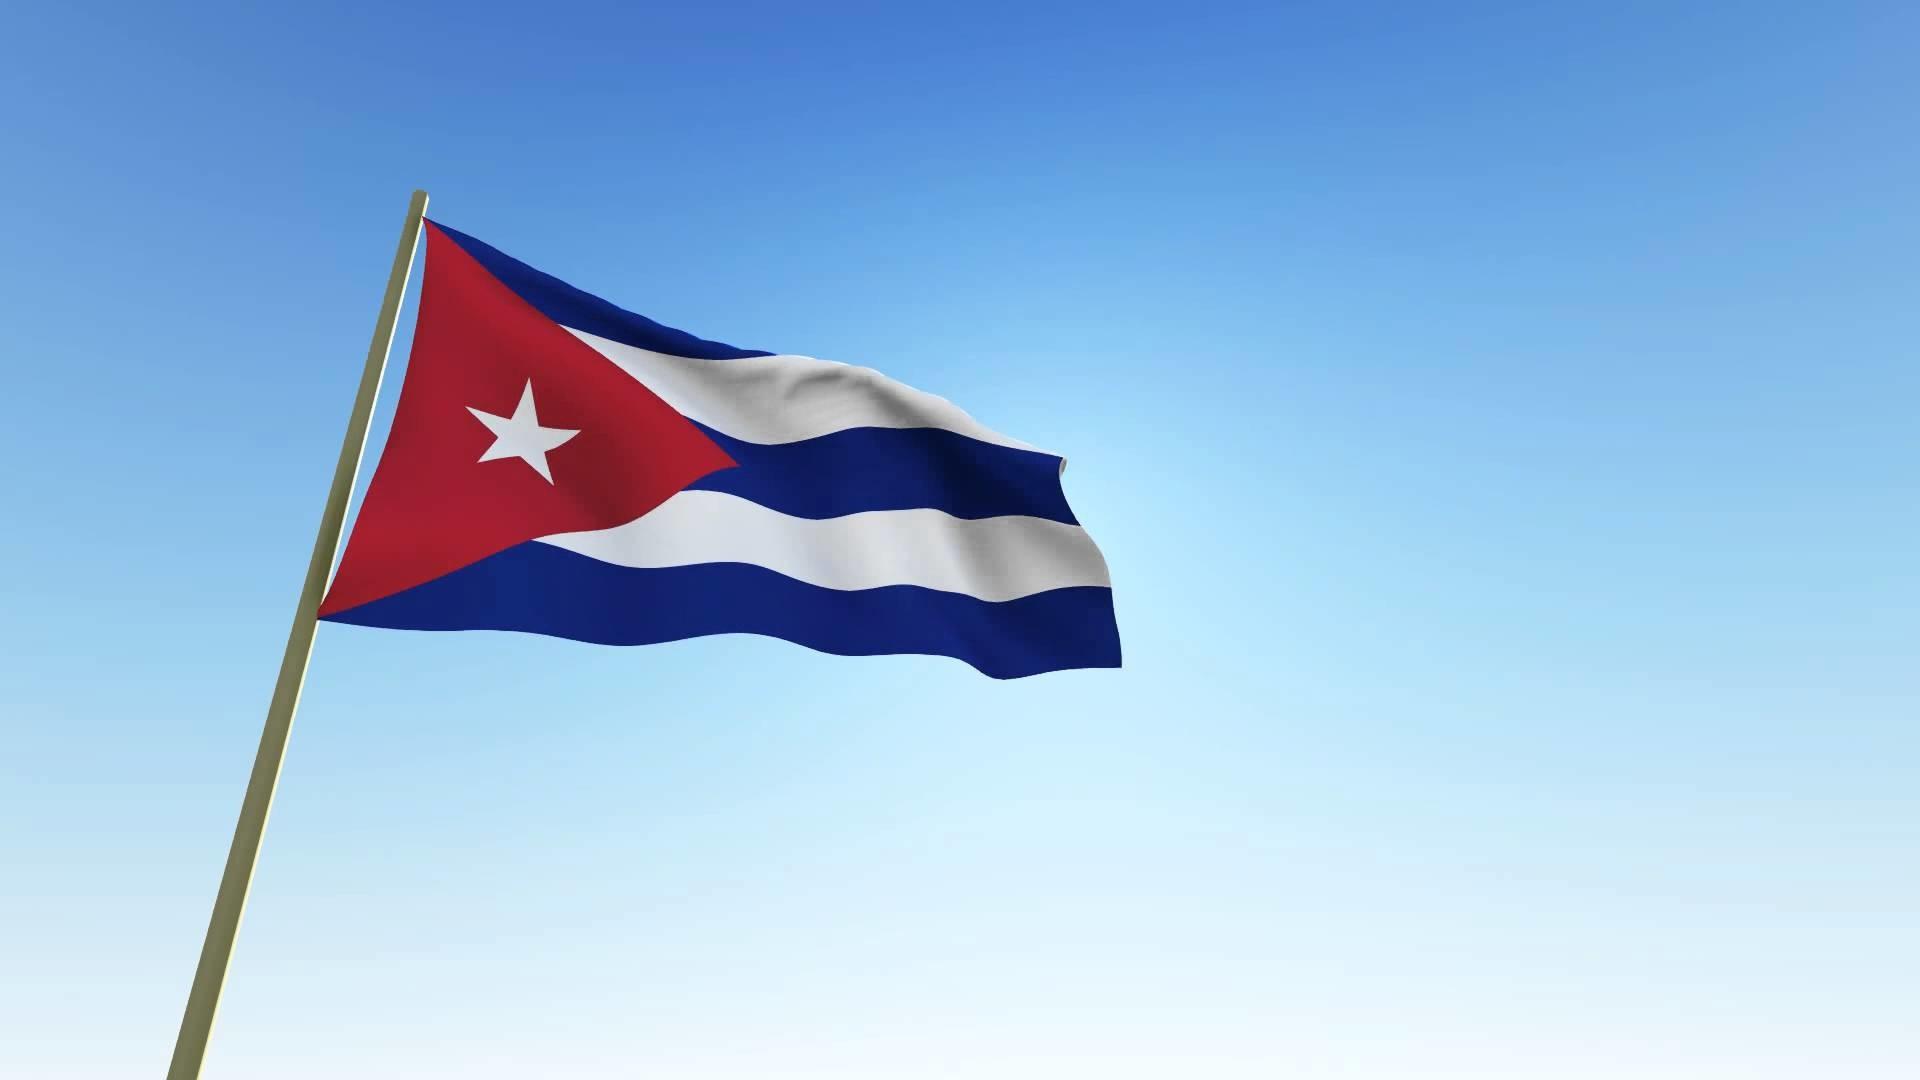 Flag Of Cuba #4